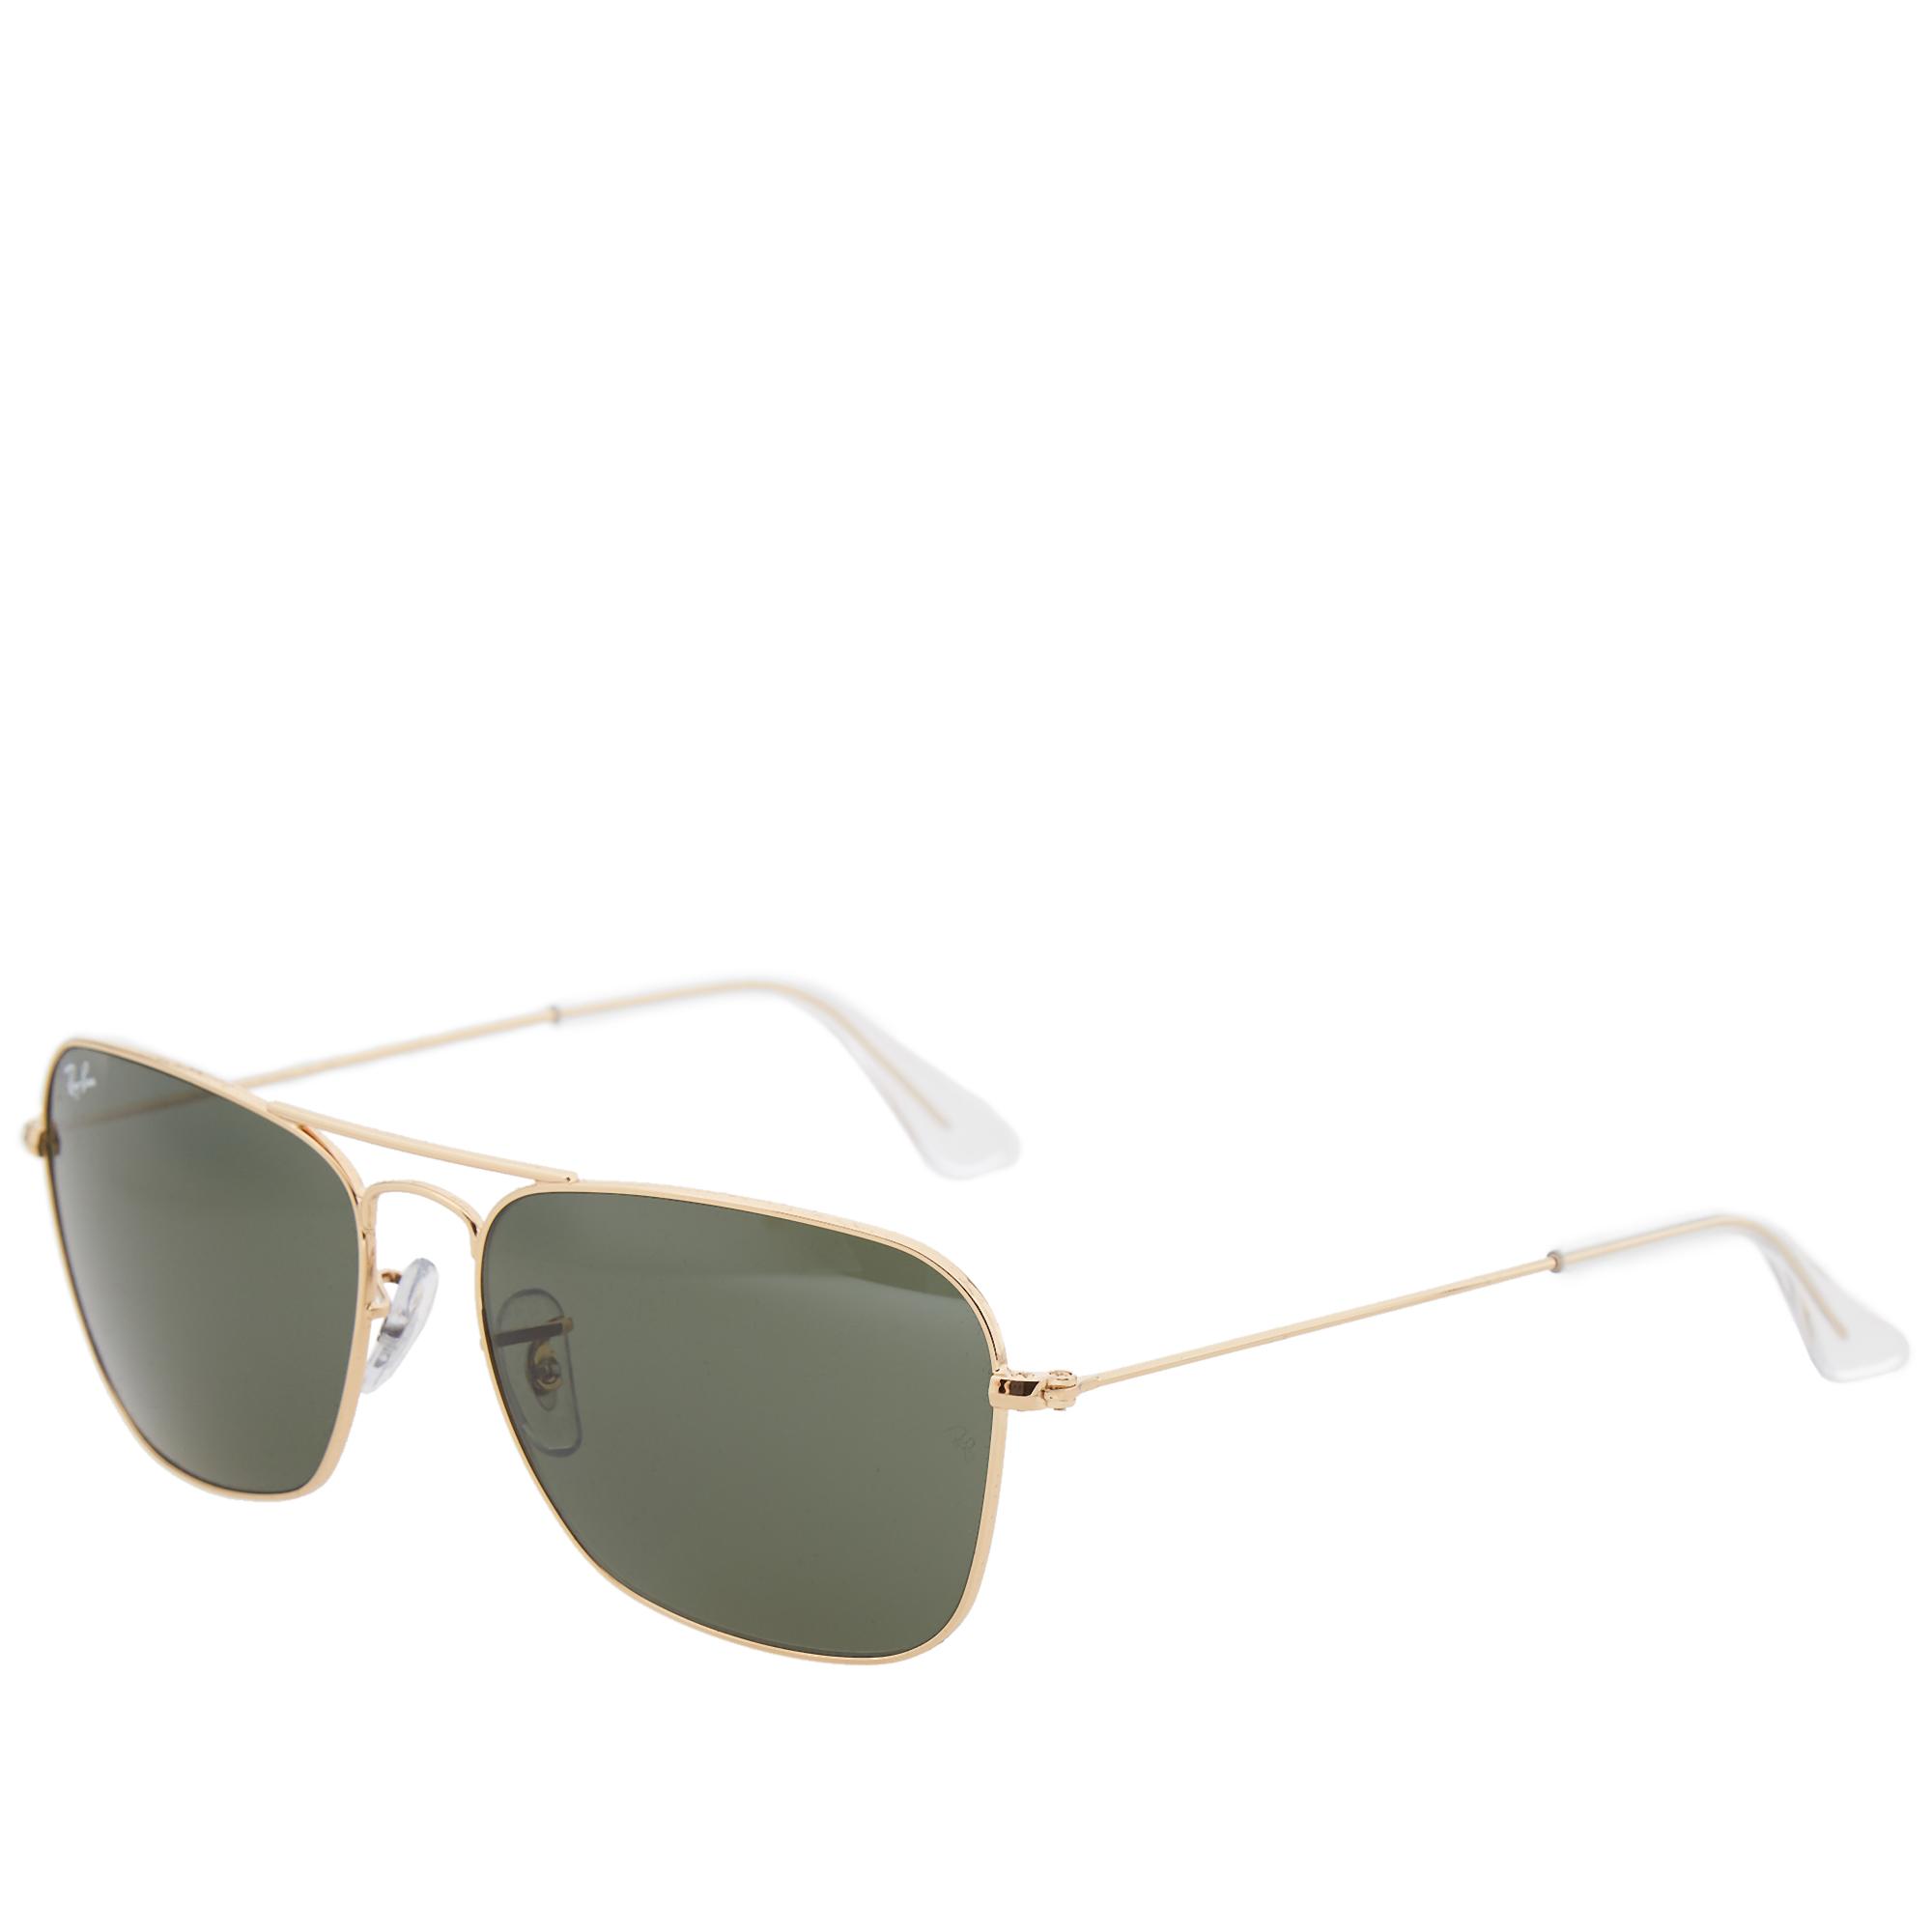 ray ban arista gold  Ray Ban Caravan Sunglasses (Arista \u0026 Crystal Green)